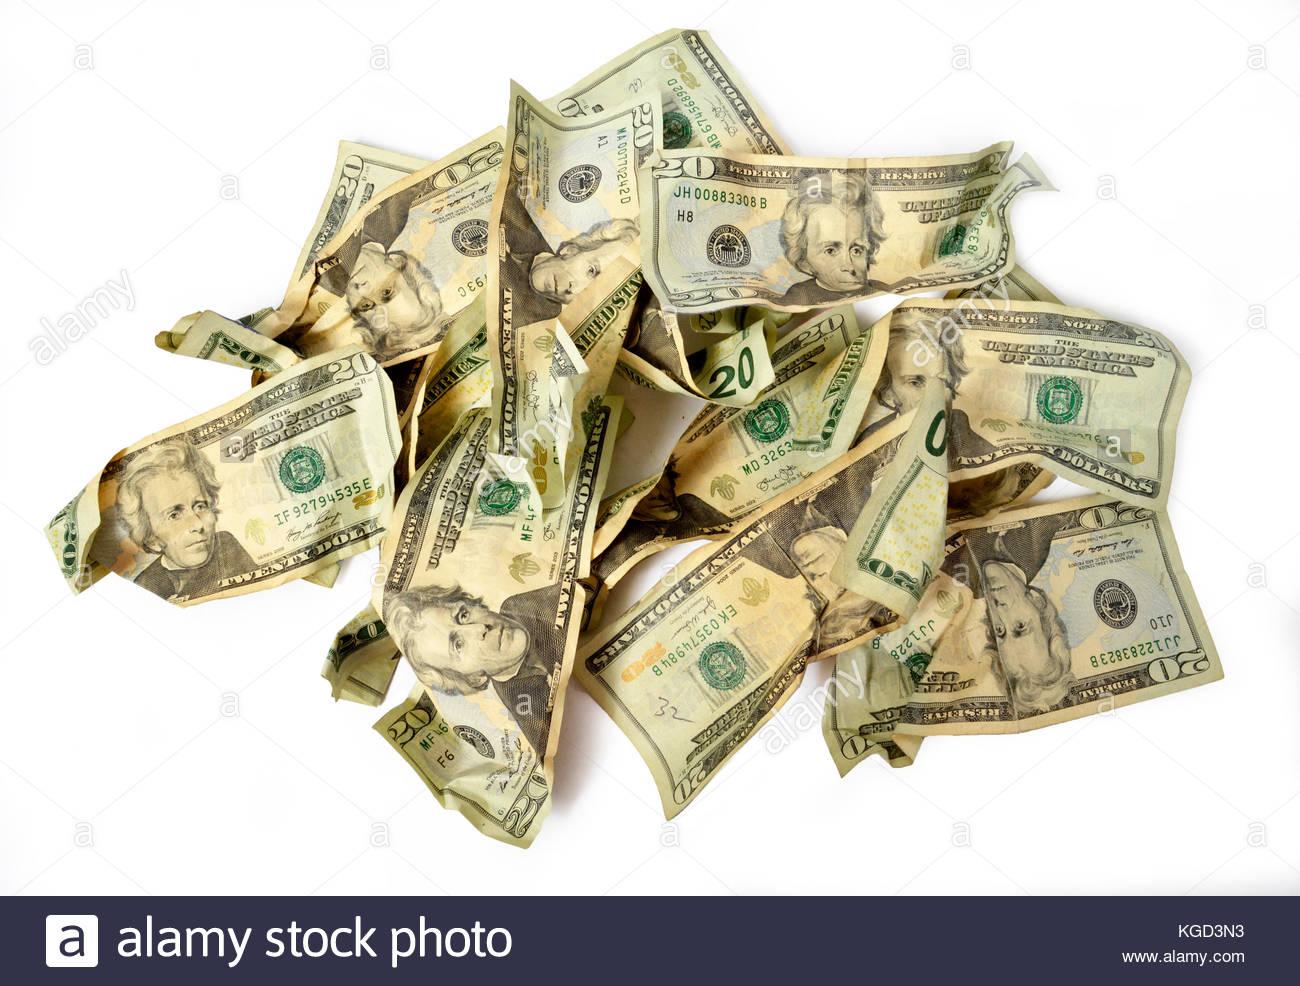 Got a bite on a swimming pool deck-horizontal-shot-pile-crumbled-twenty-dollar-bills-white-kgd3n3.jpg